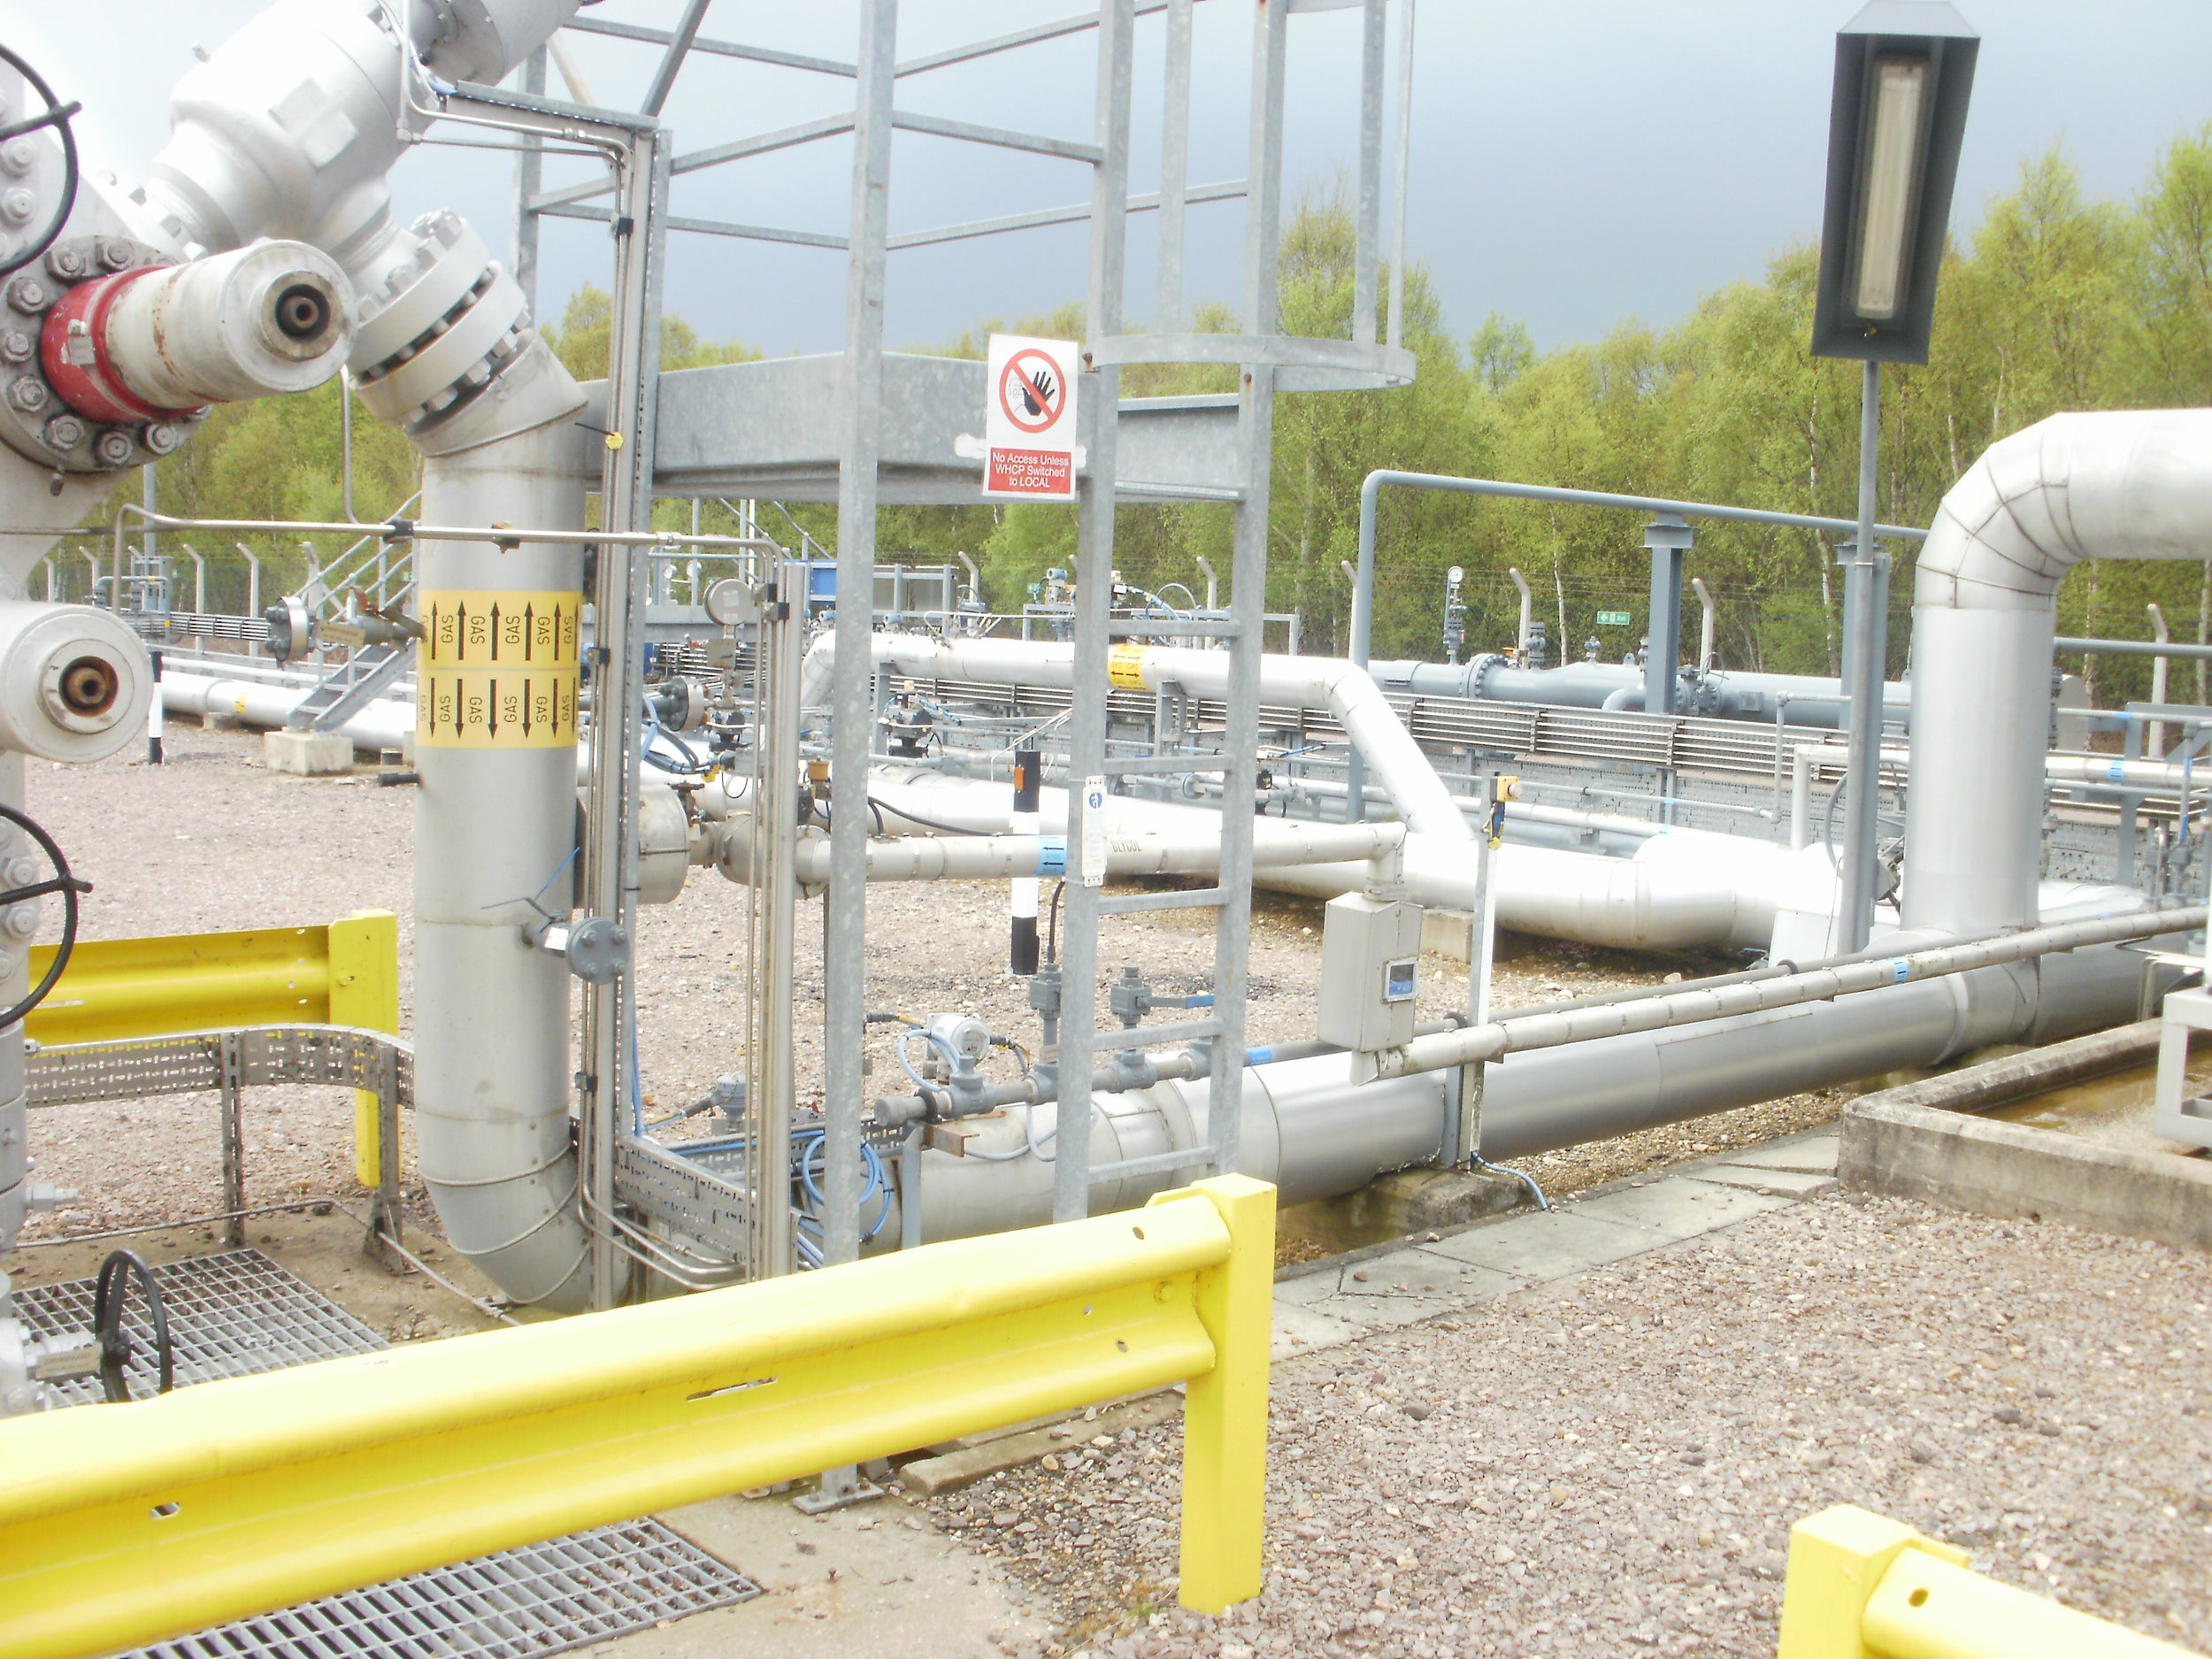 Gas storage site pipe work